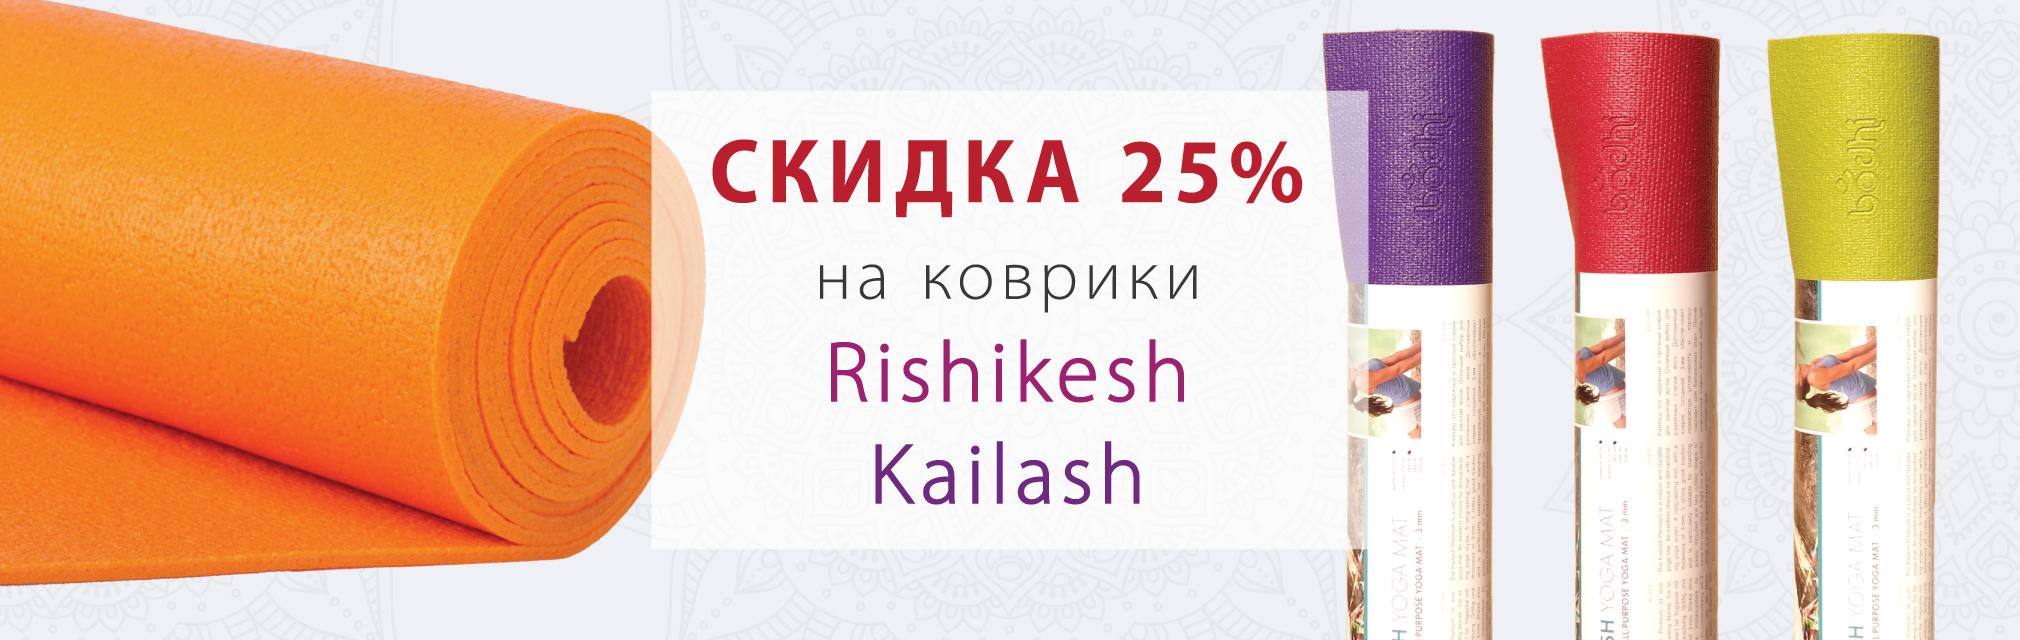 Скидки 25% на коврики Rishikesh и Kailash